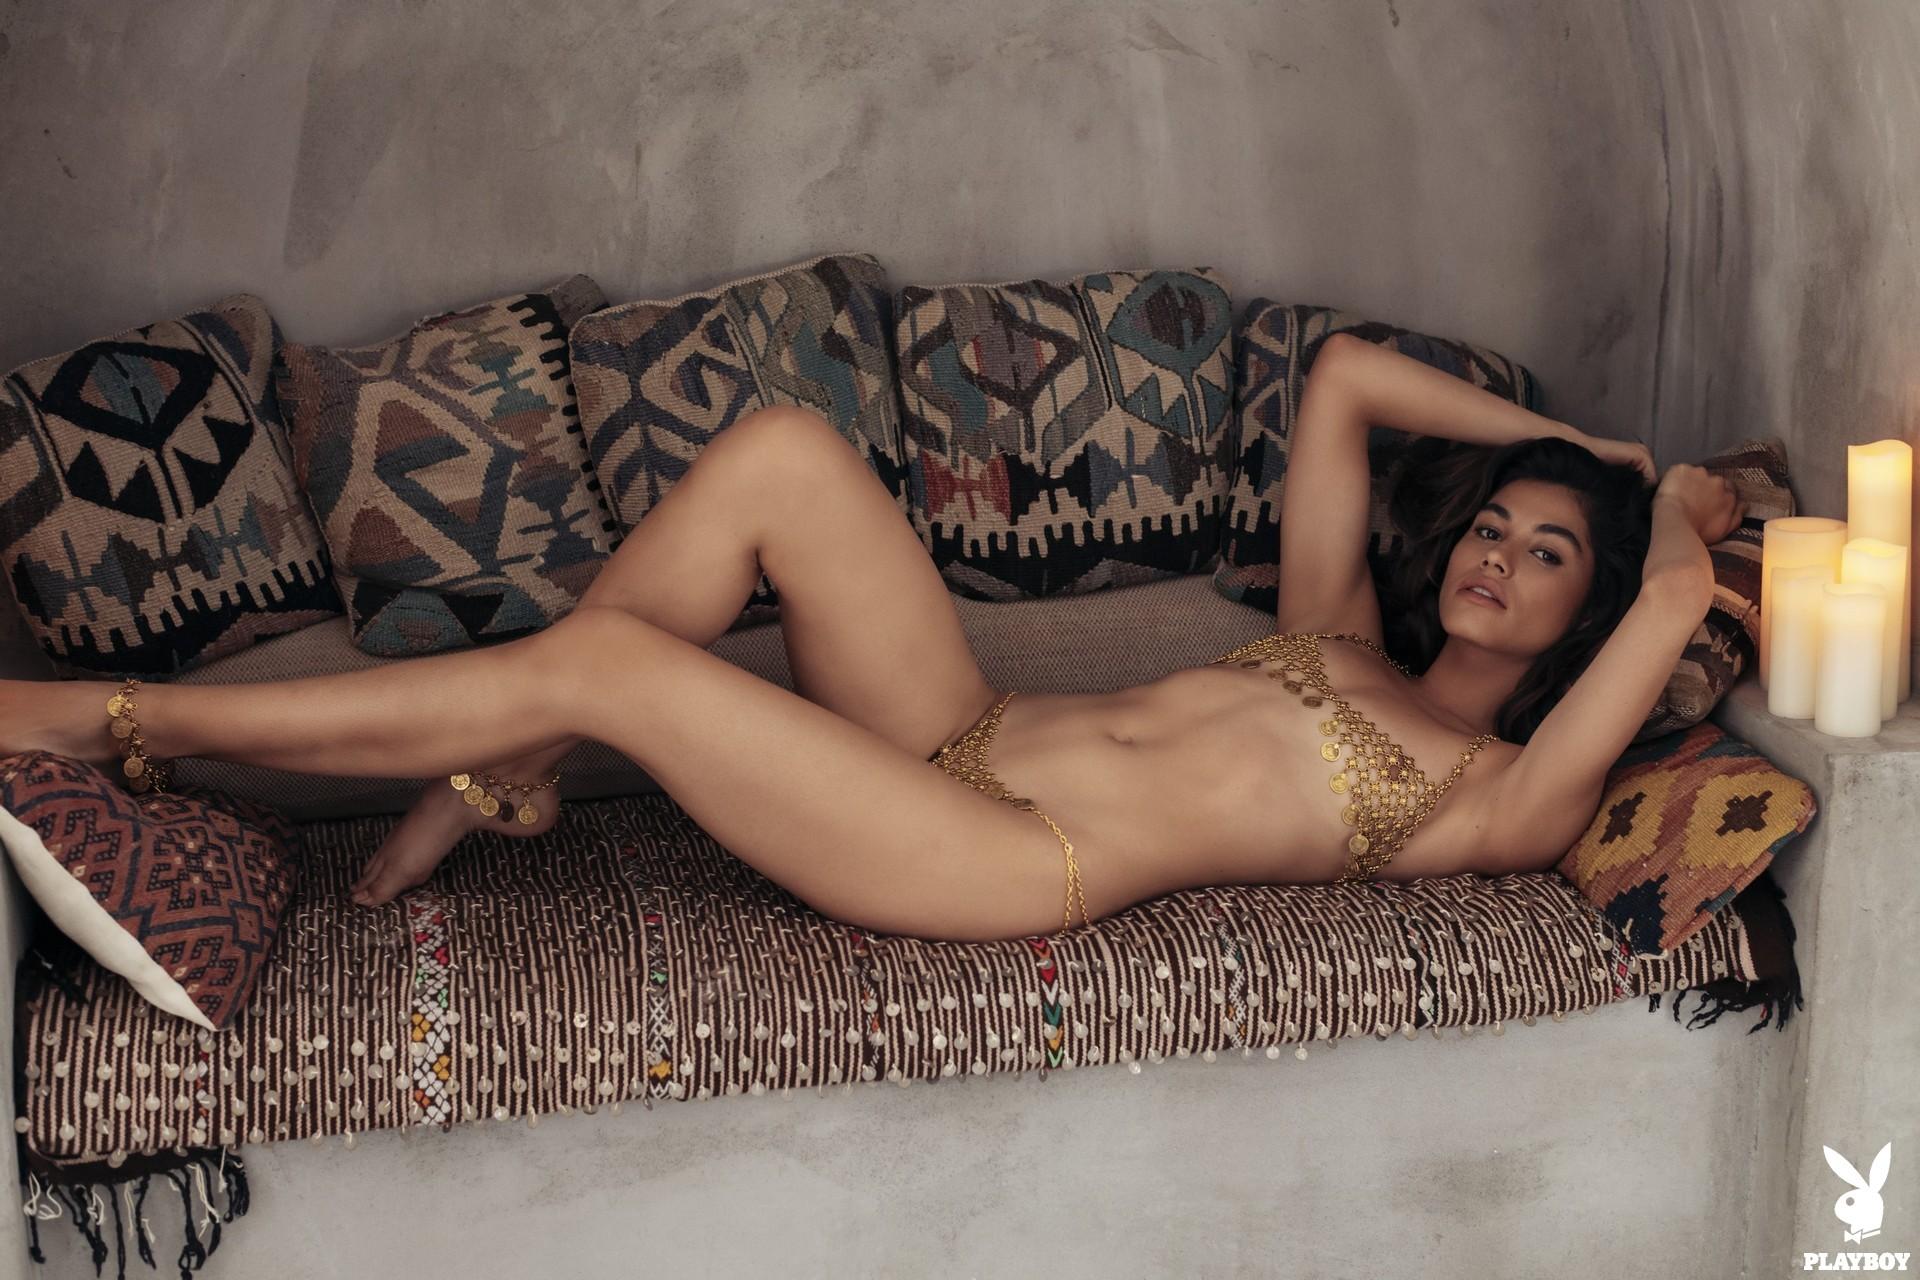 Playmate August 2018: Lorena Medina - Playboy Plus 26